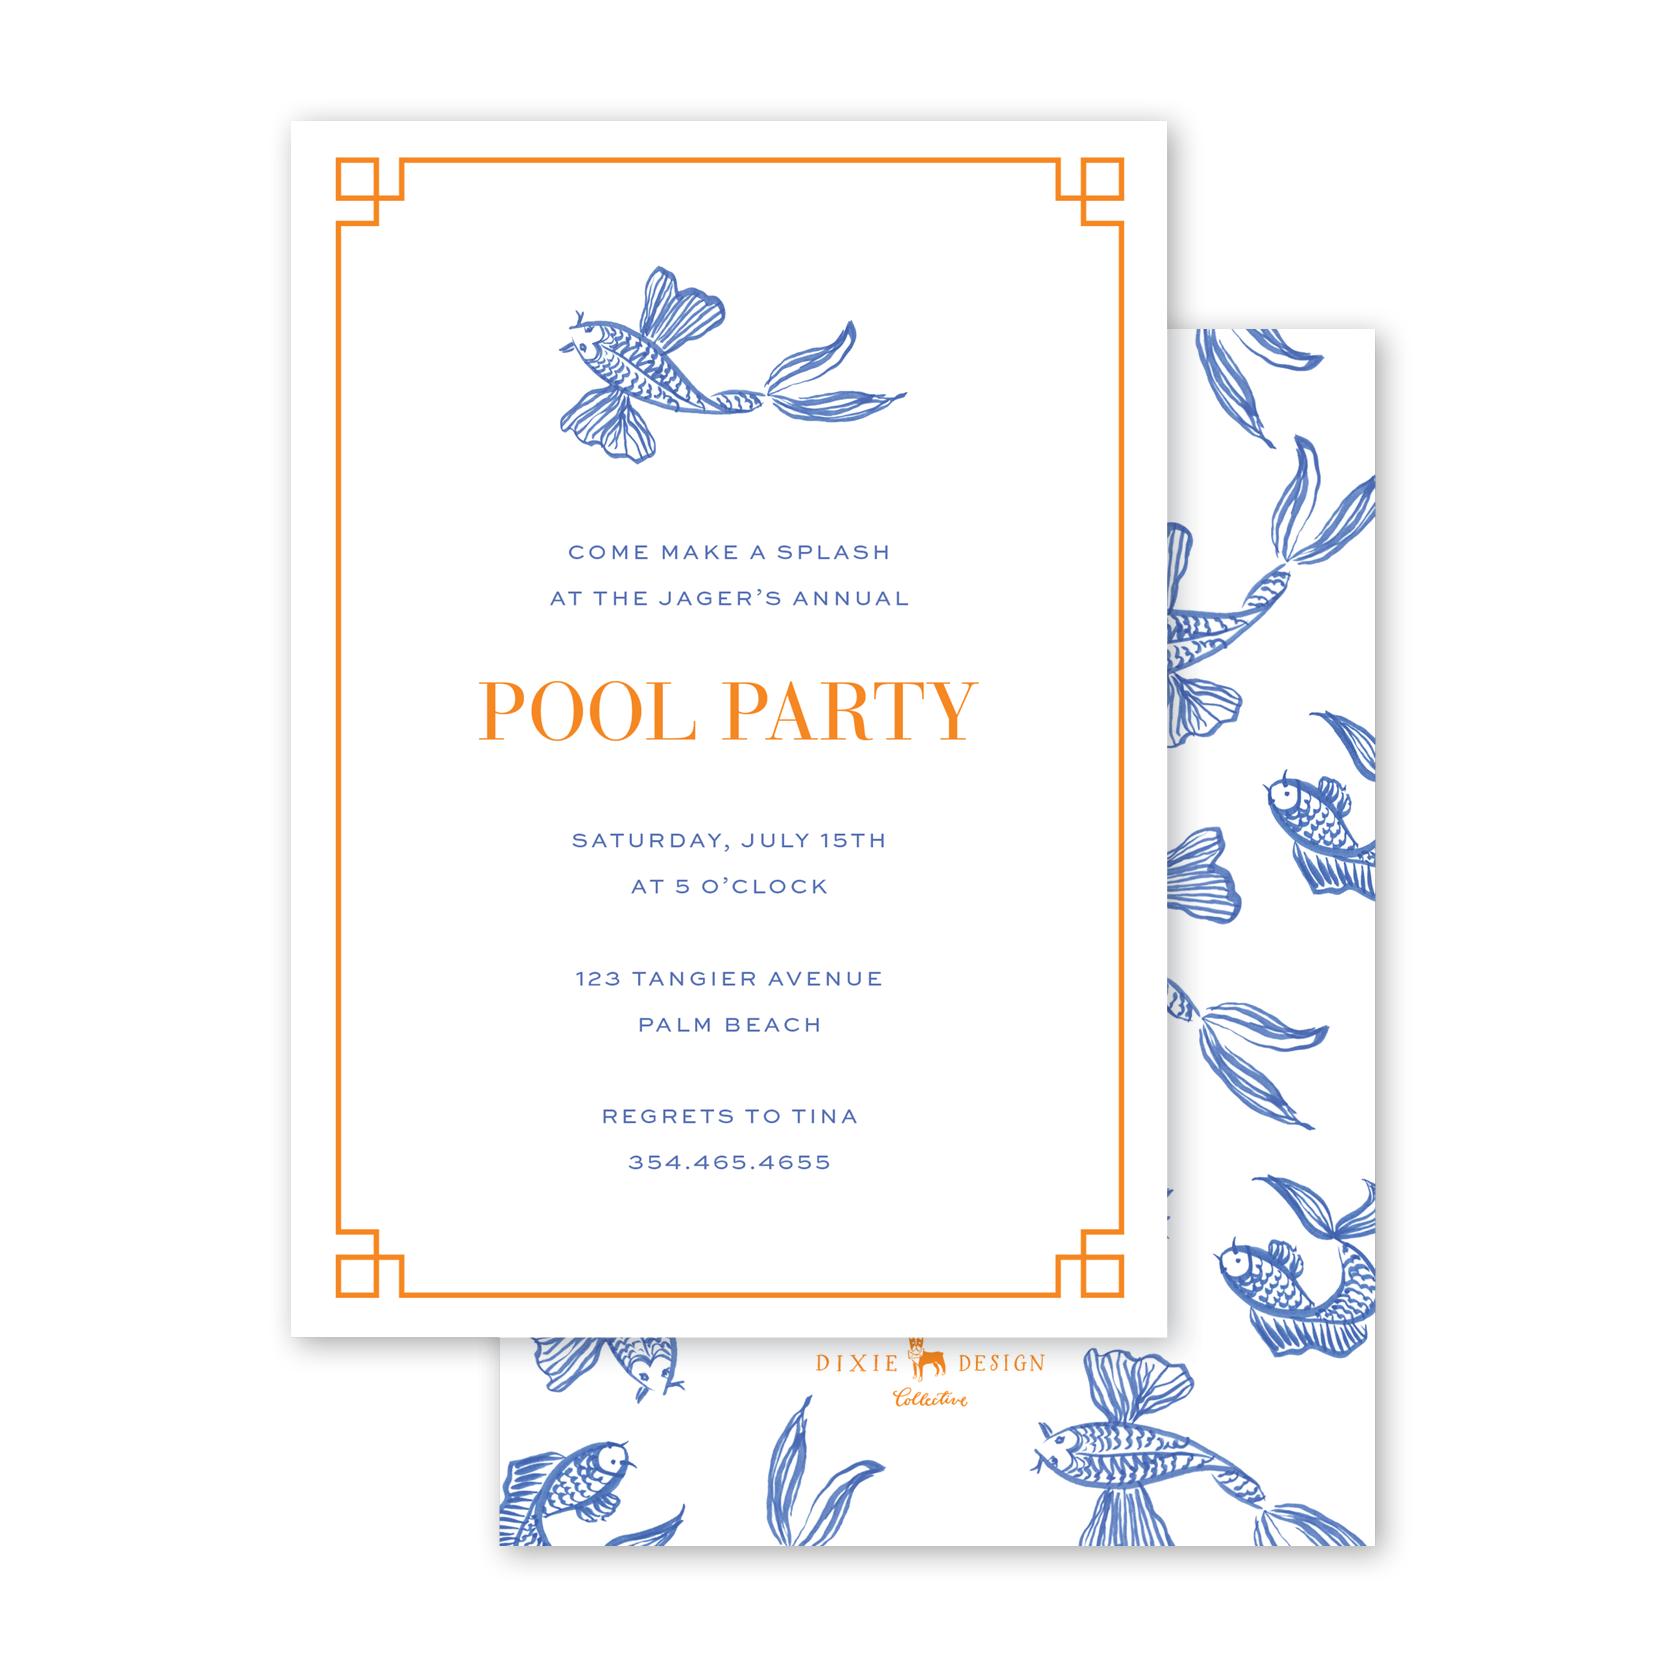 2017_Hollon_Koi Fish_Summer Party Invite_A6_Thumb_1.png